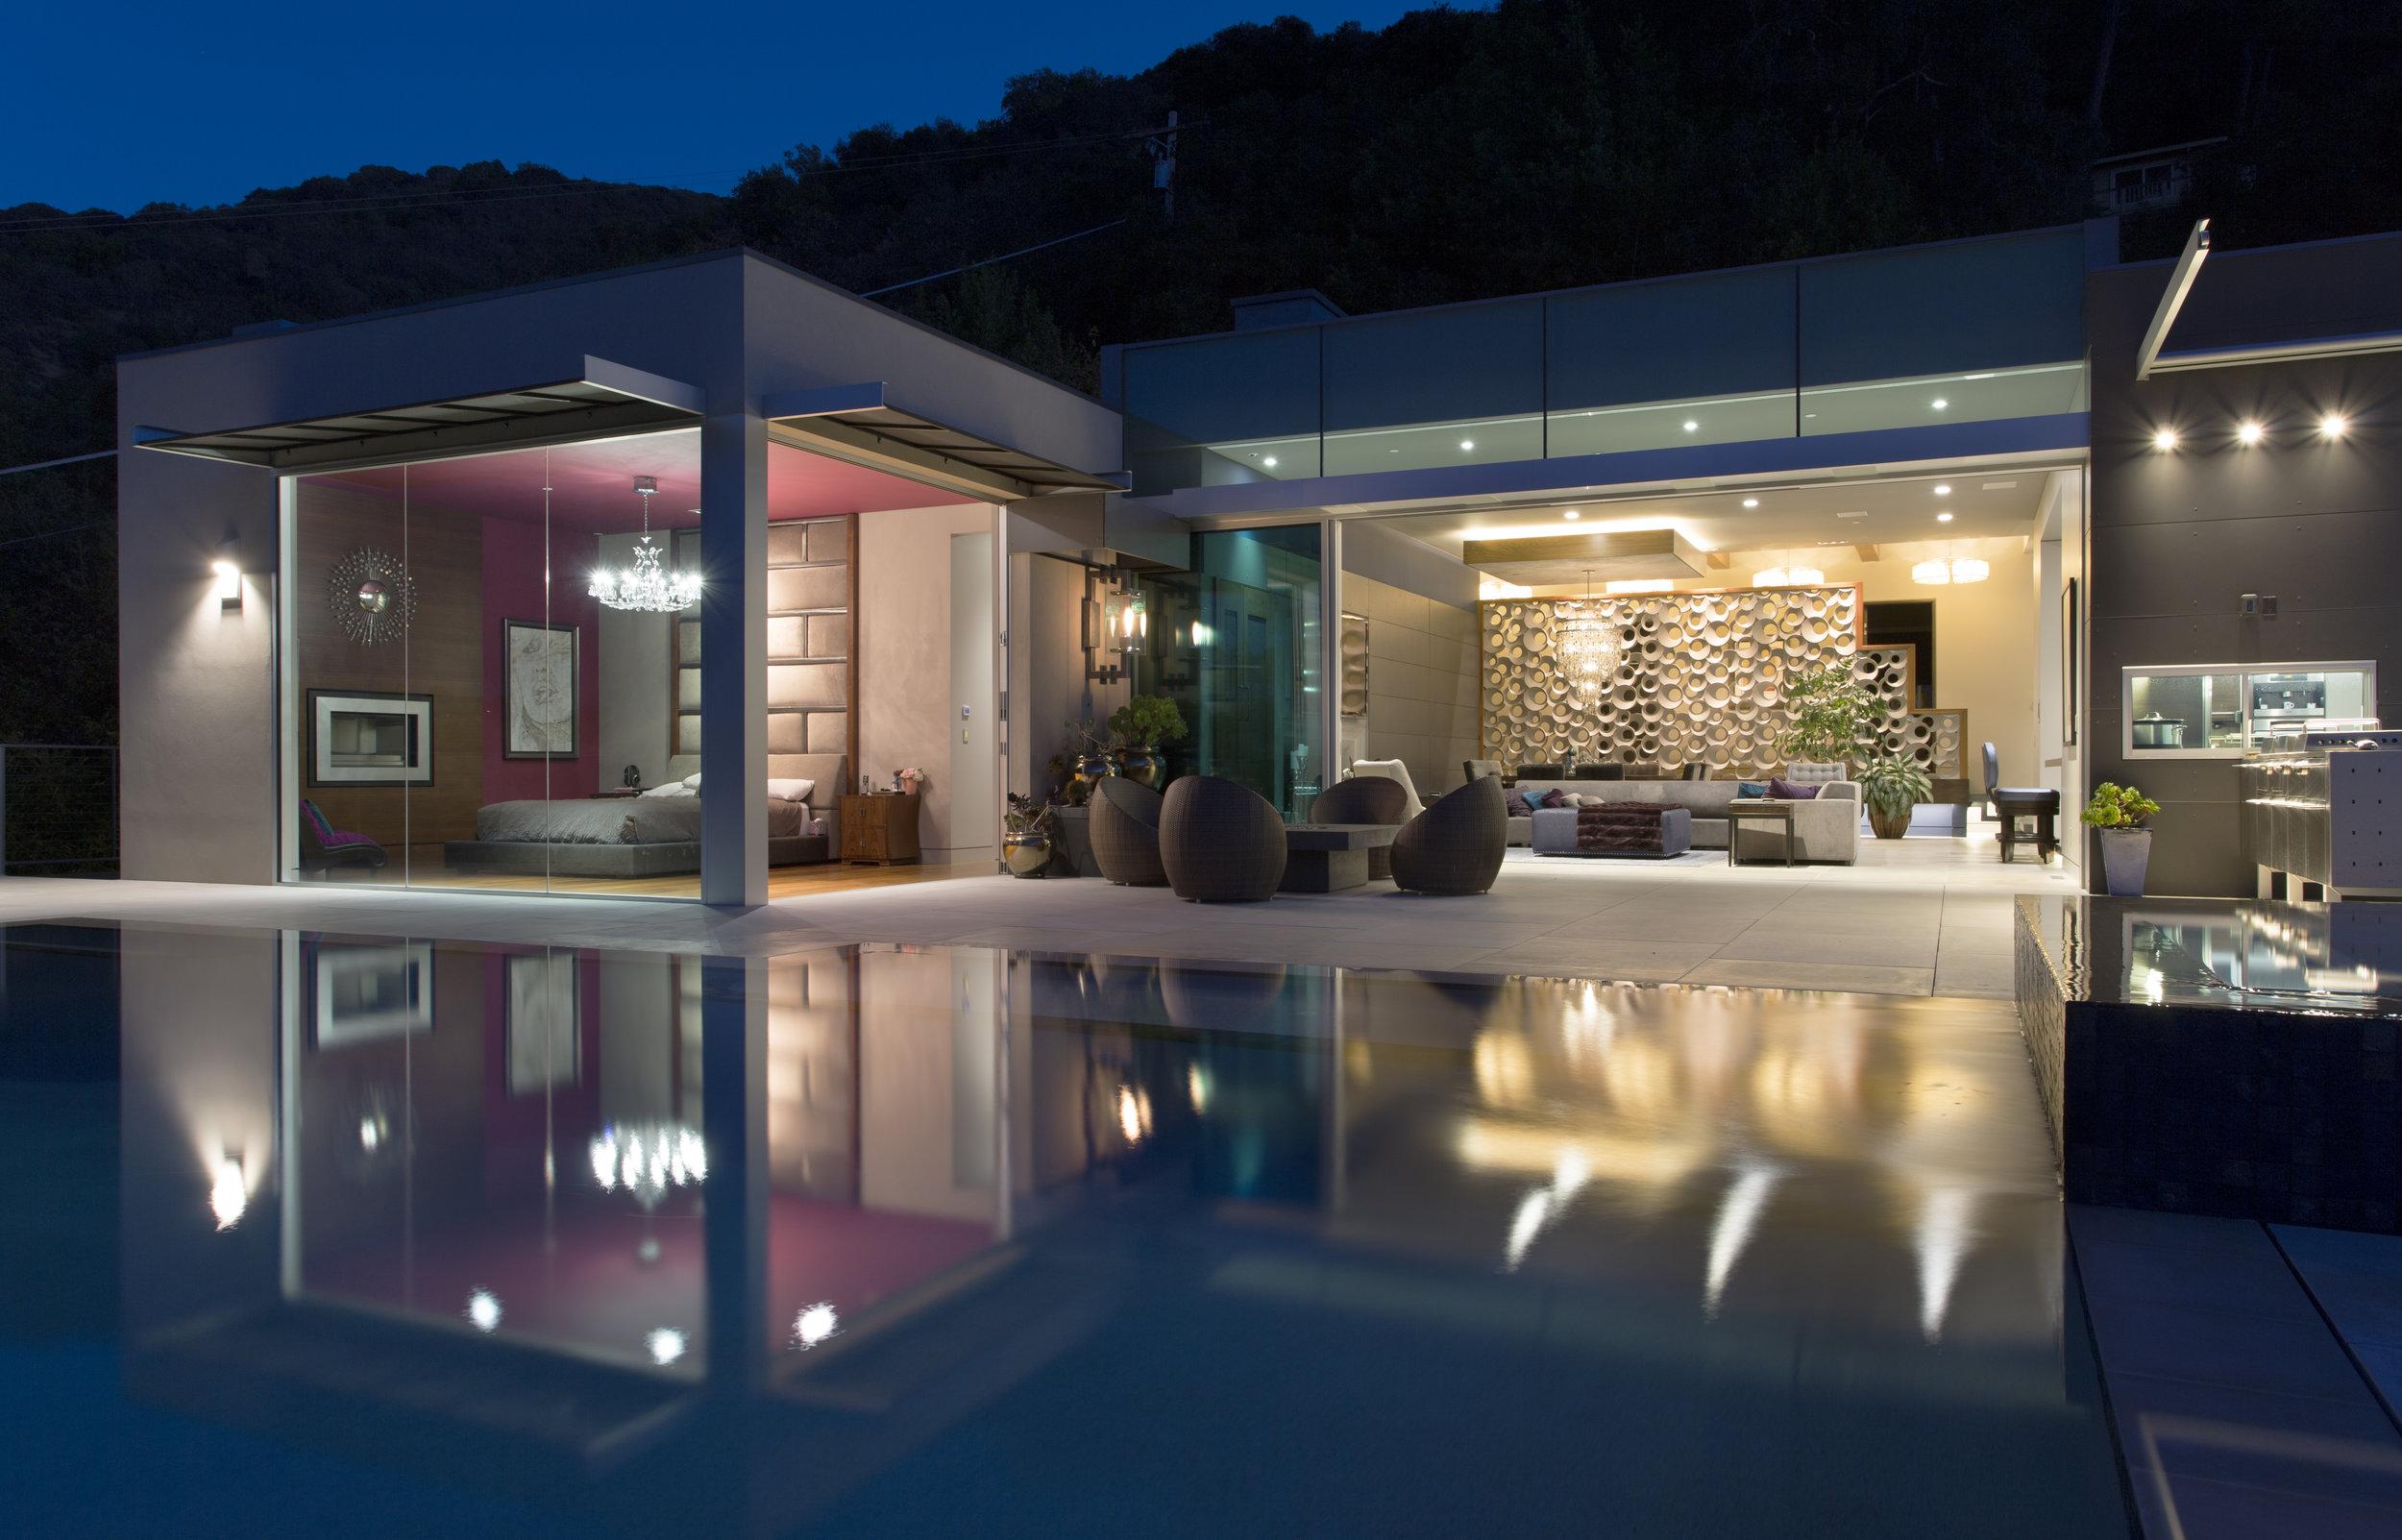 Los Gatos Bay Area custom house design Gentry Magazine Russell Simpkins photography